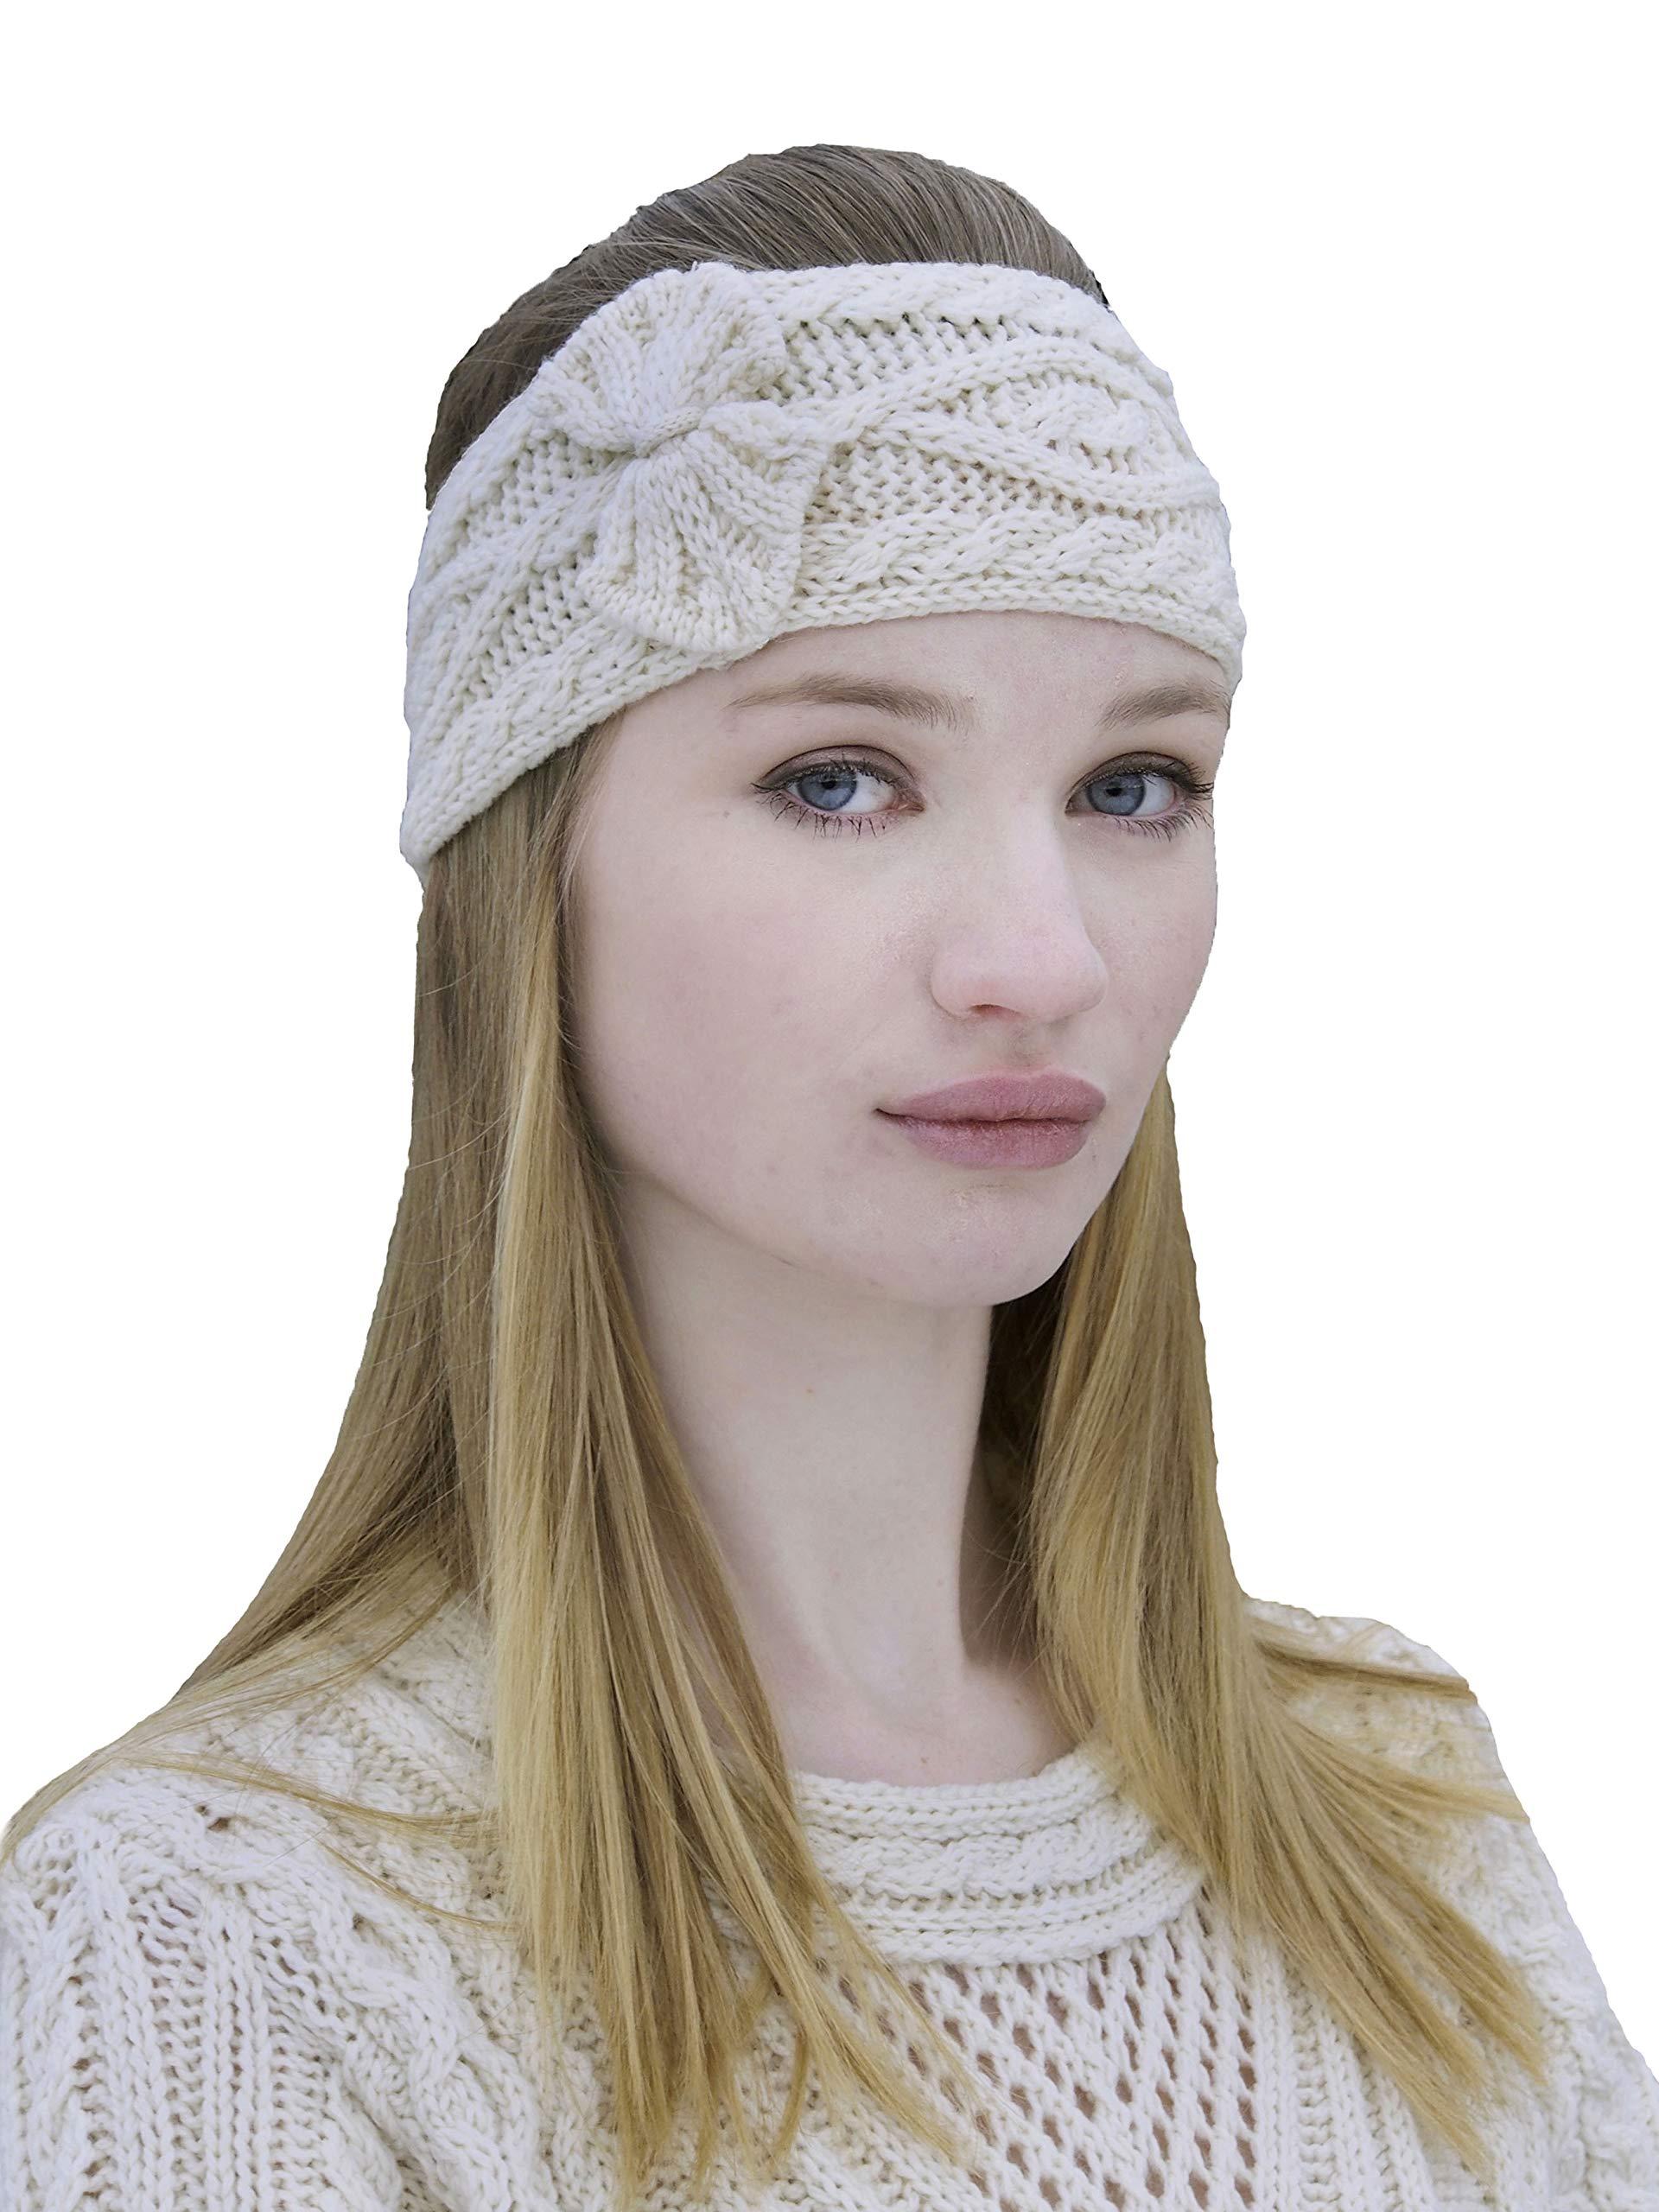 Aran Crafts Headband (100% Merino Wool) One Size Natural (X4341-NAT)